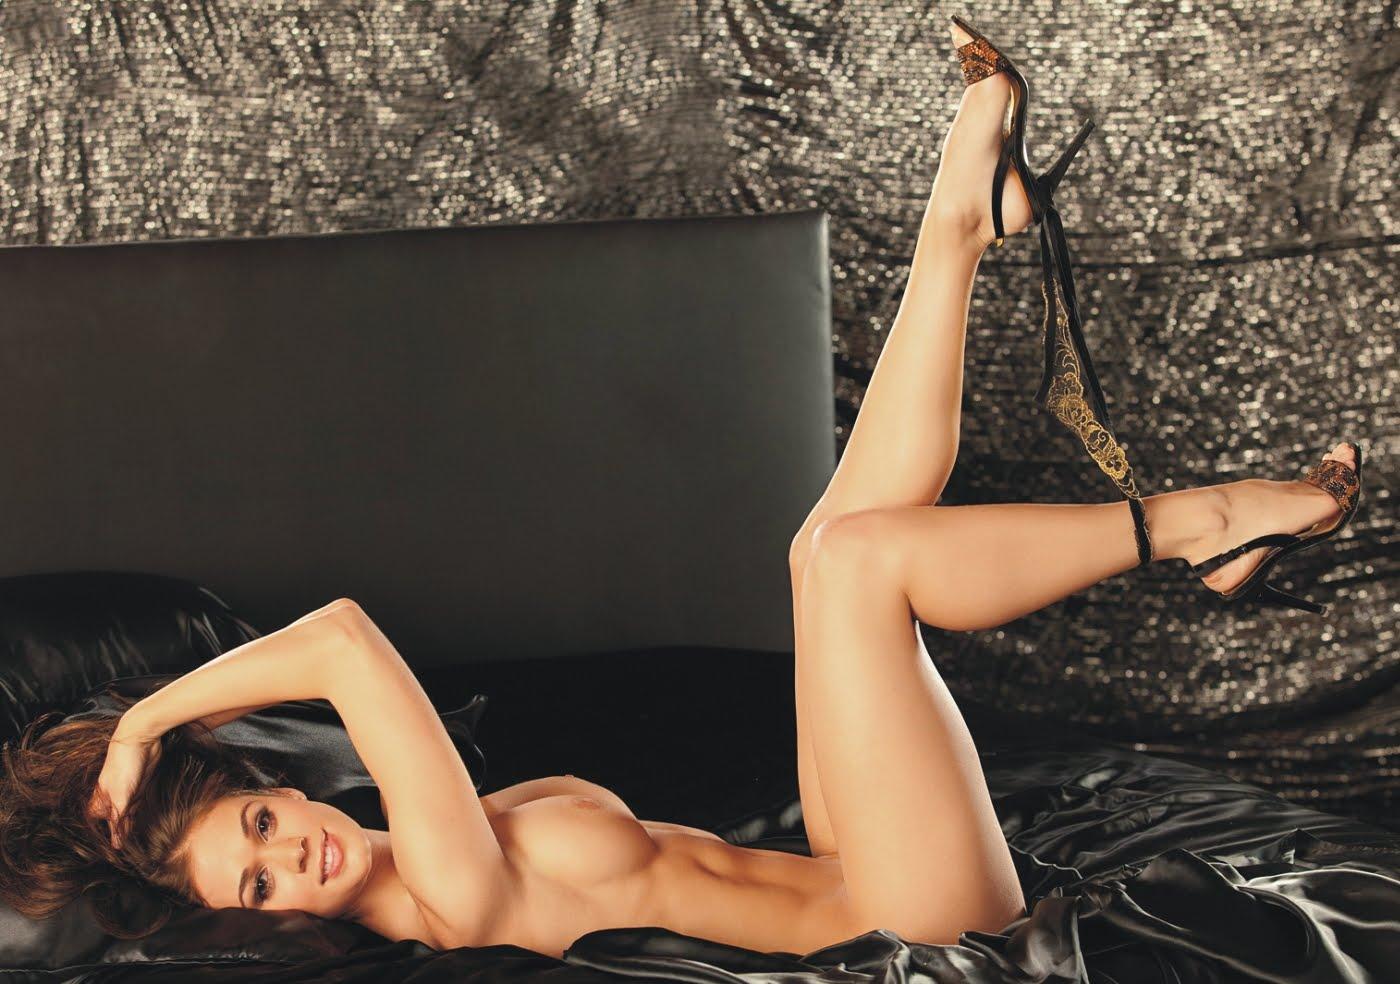 Melissa riso nude